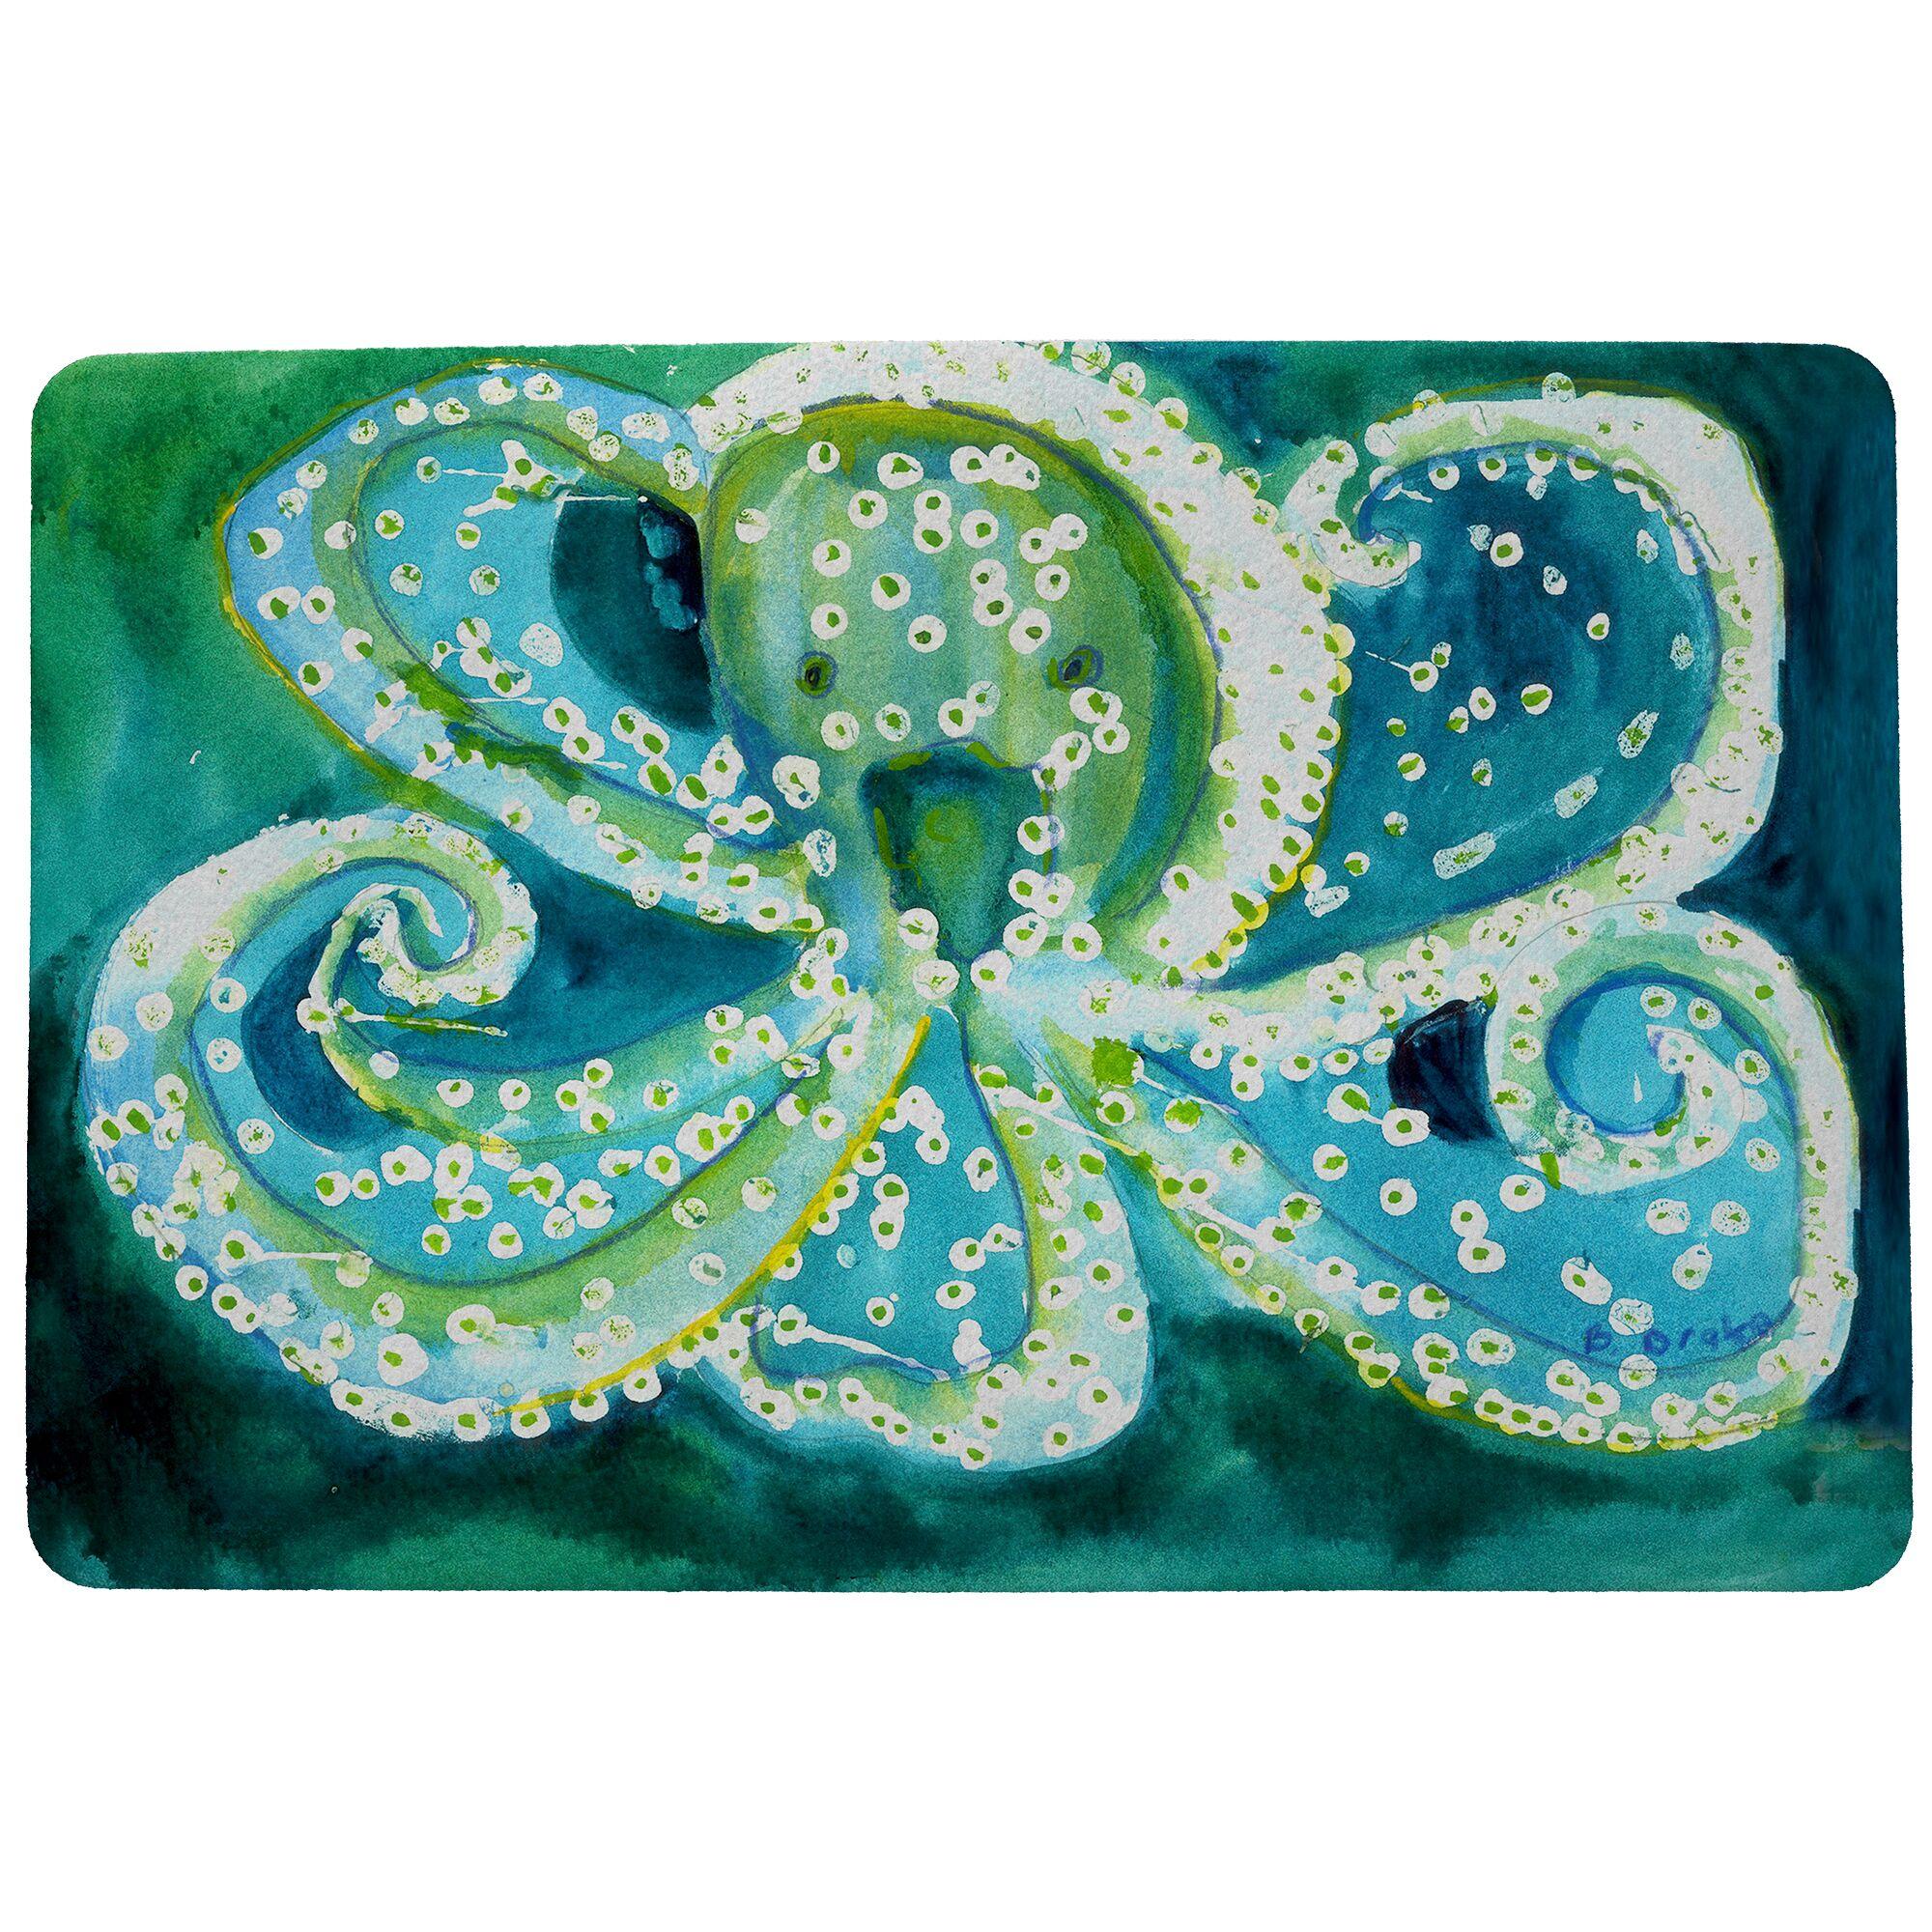 Affric Octopus Doormat Mat Size: Rectangle 30